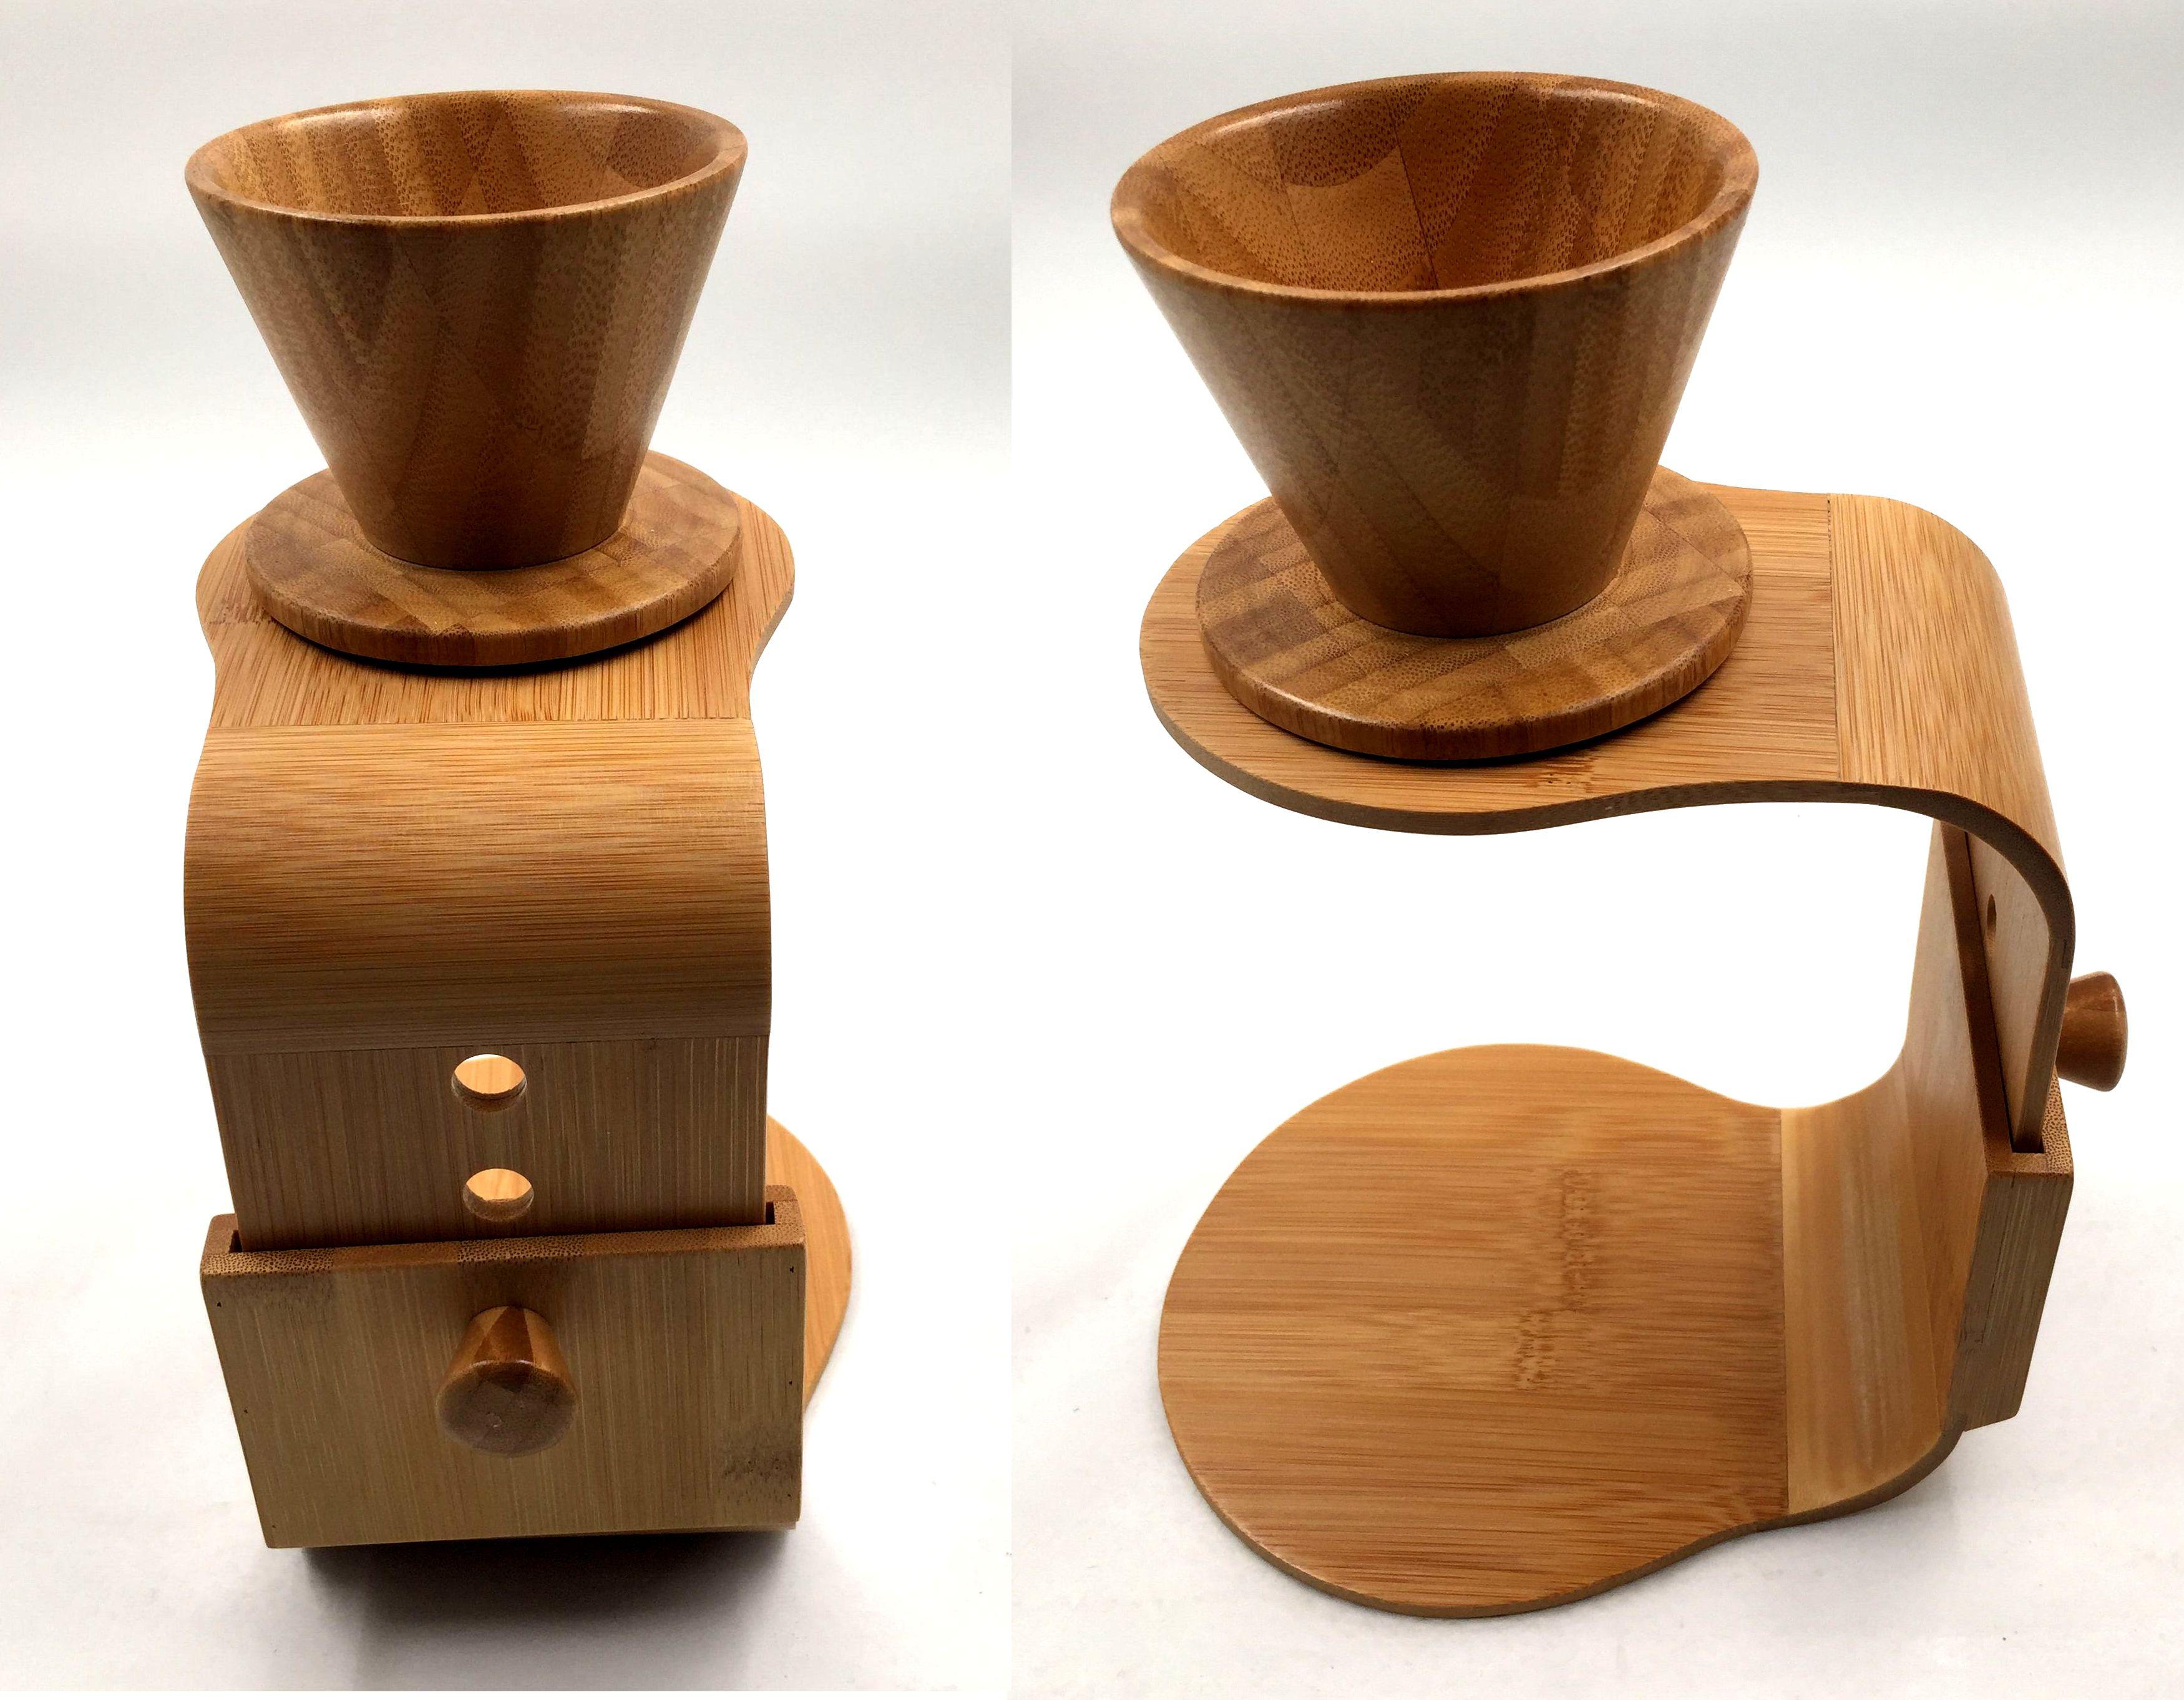 Bamboo coffee maker